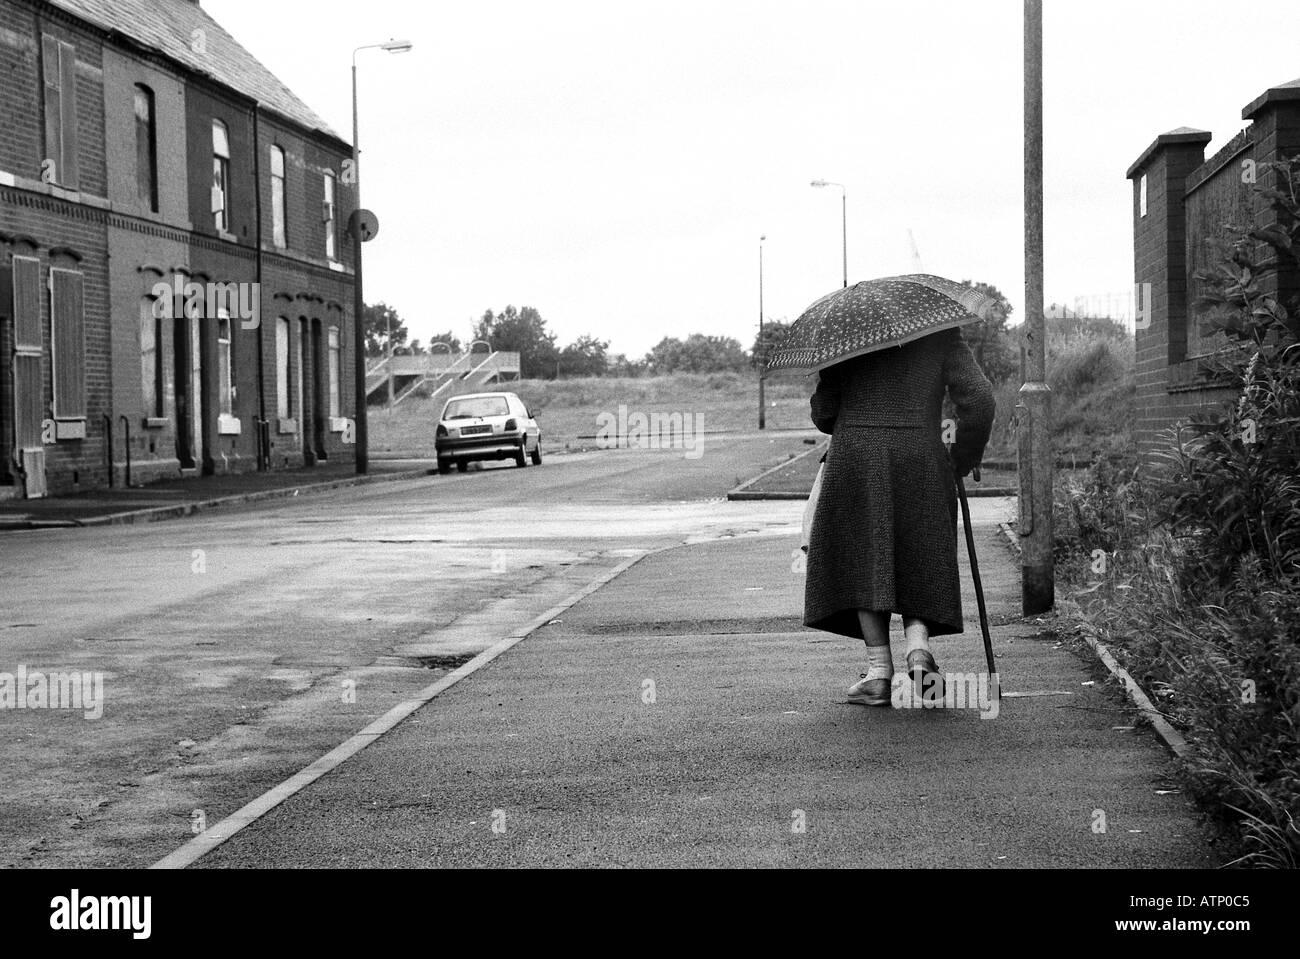 Elderly woman walking in rain in urban enviroment - Stock Image